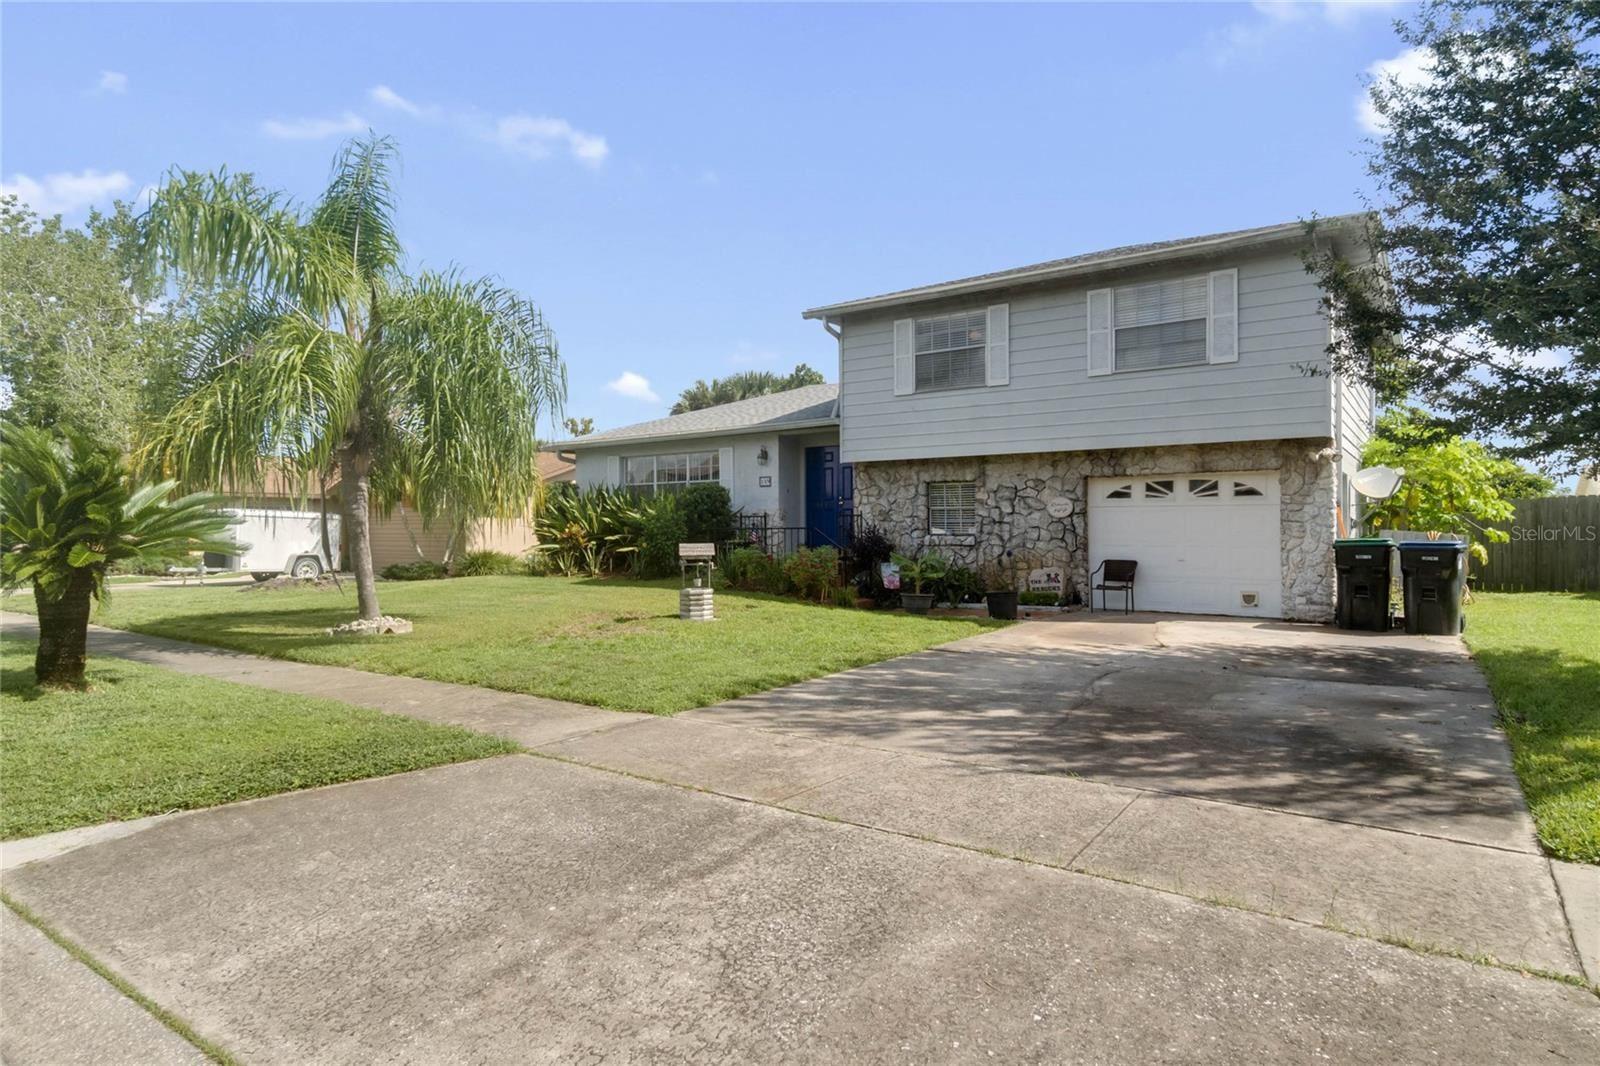 149 CINNAMON DRIVE, Orlando, FL 32825 - #: O5972454